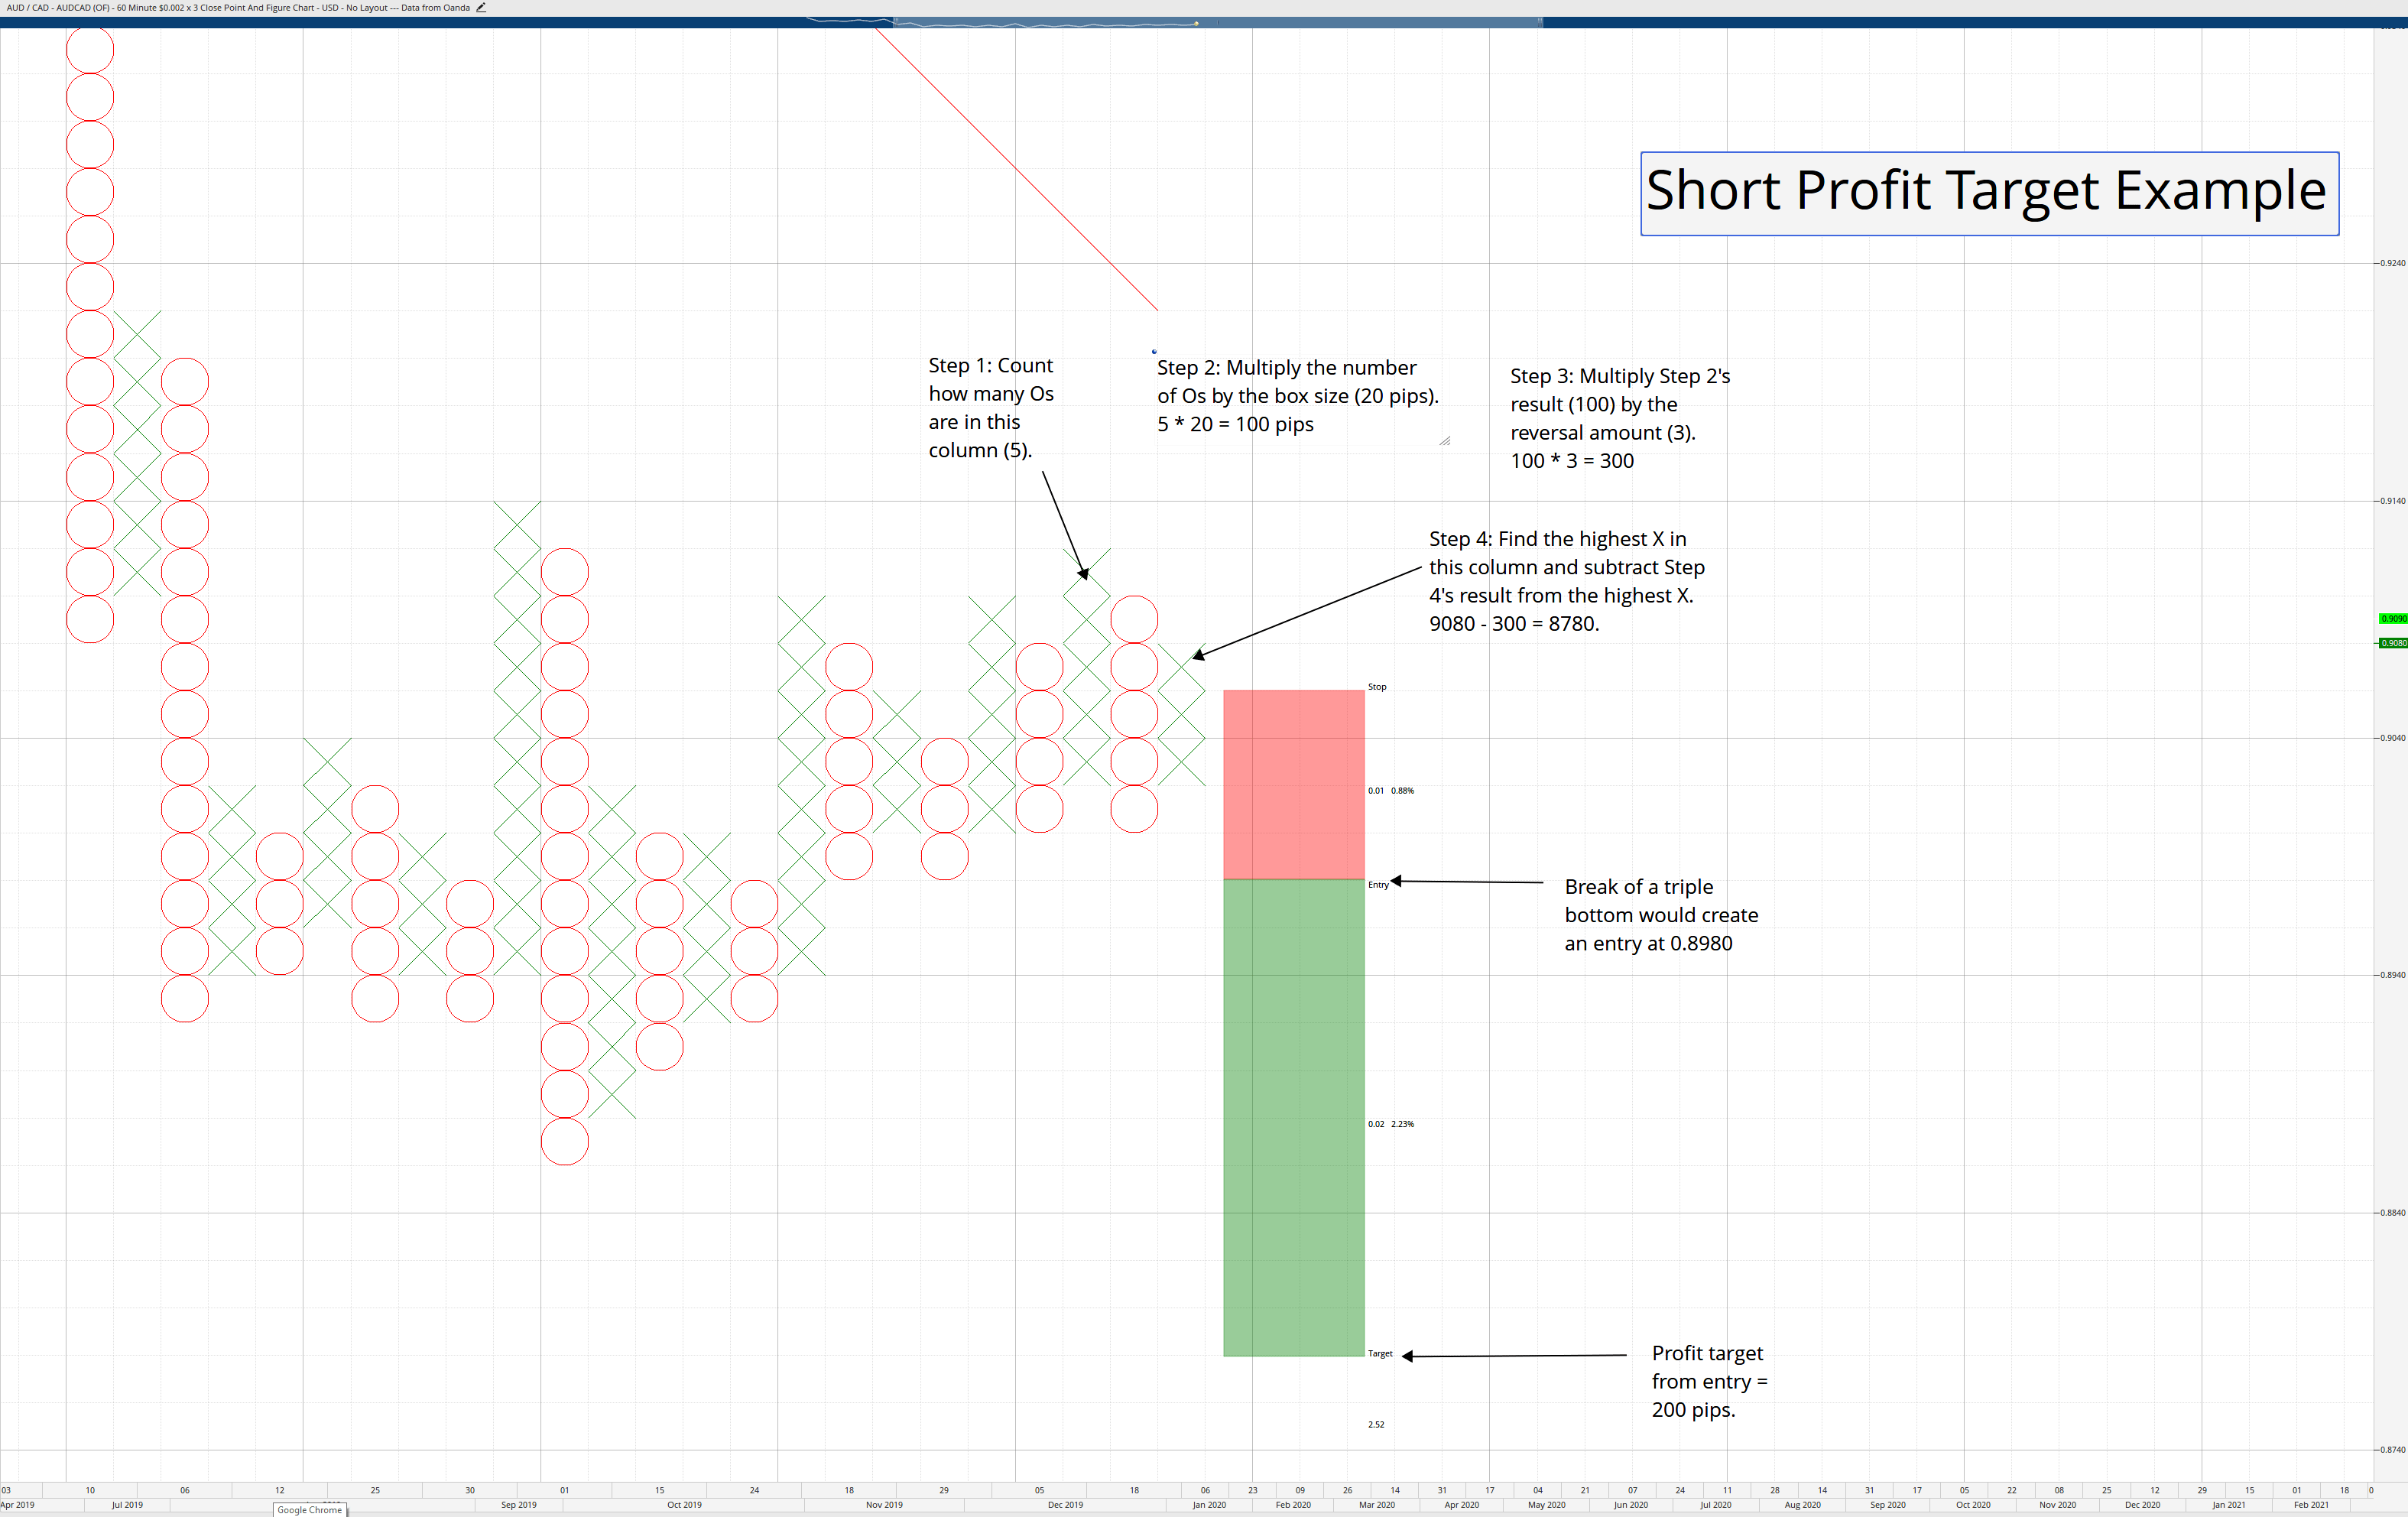 Short Profit Target